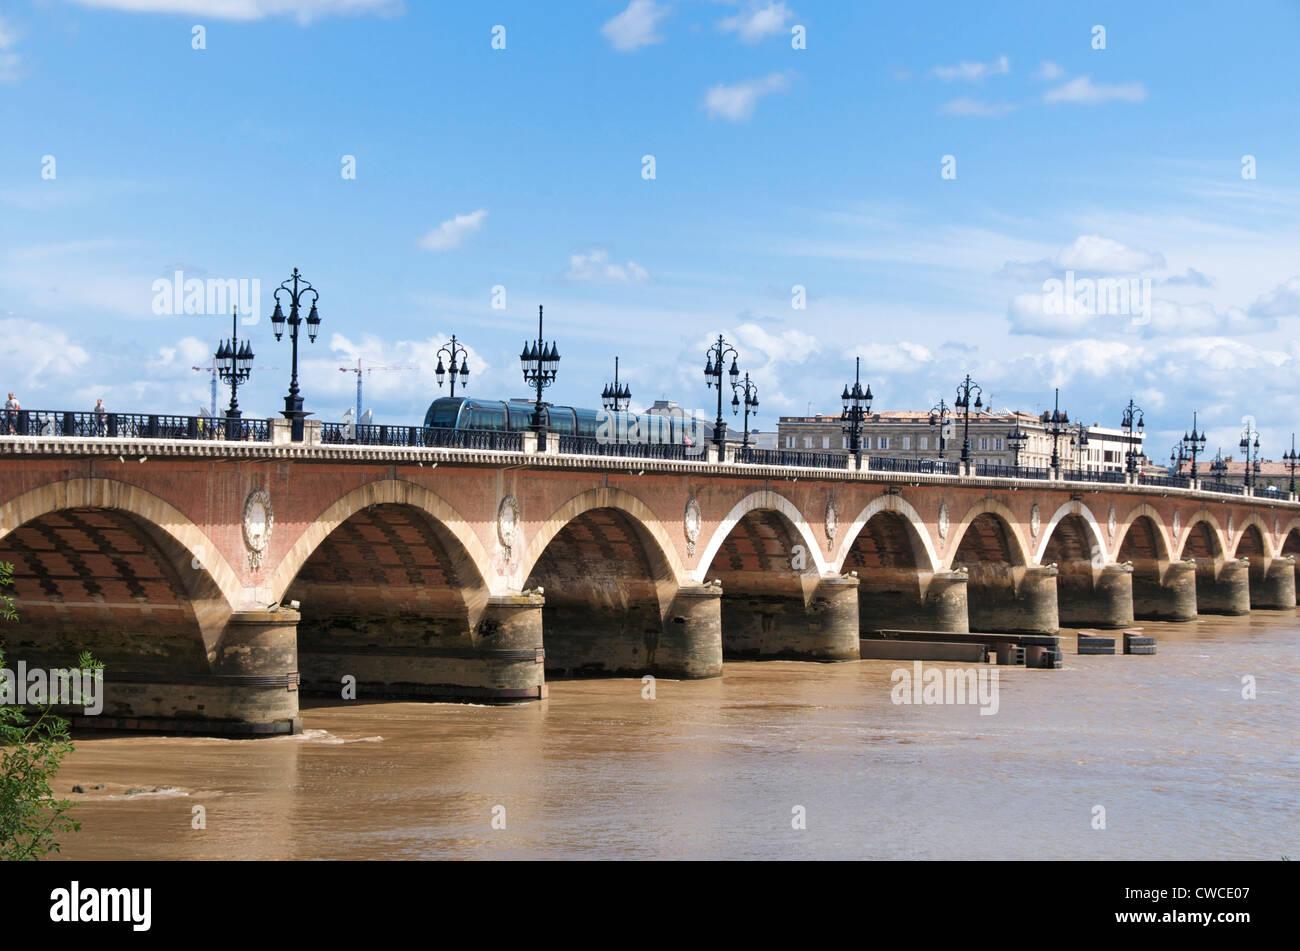 Tram crossing Pont de Pierre, Bordeaux, Gironde, France, Europe - Stock Image